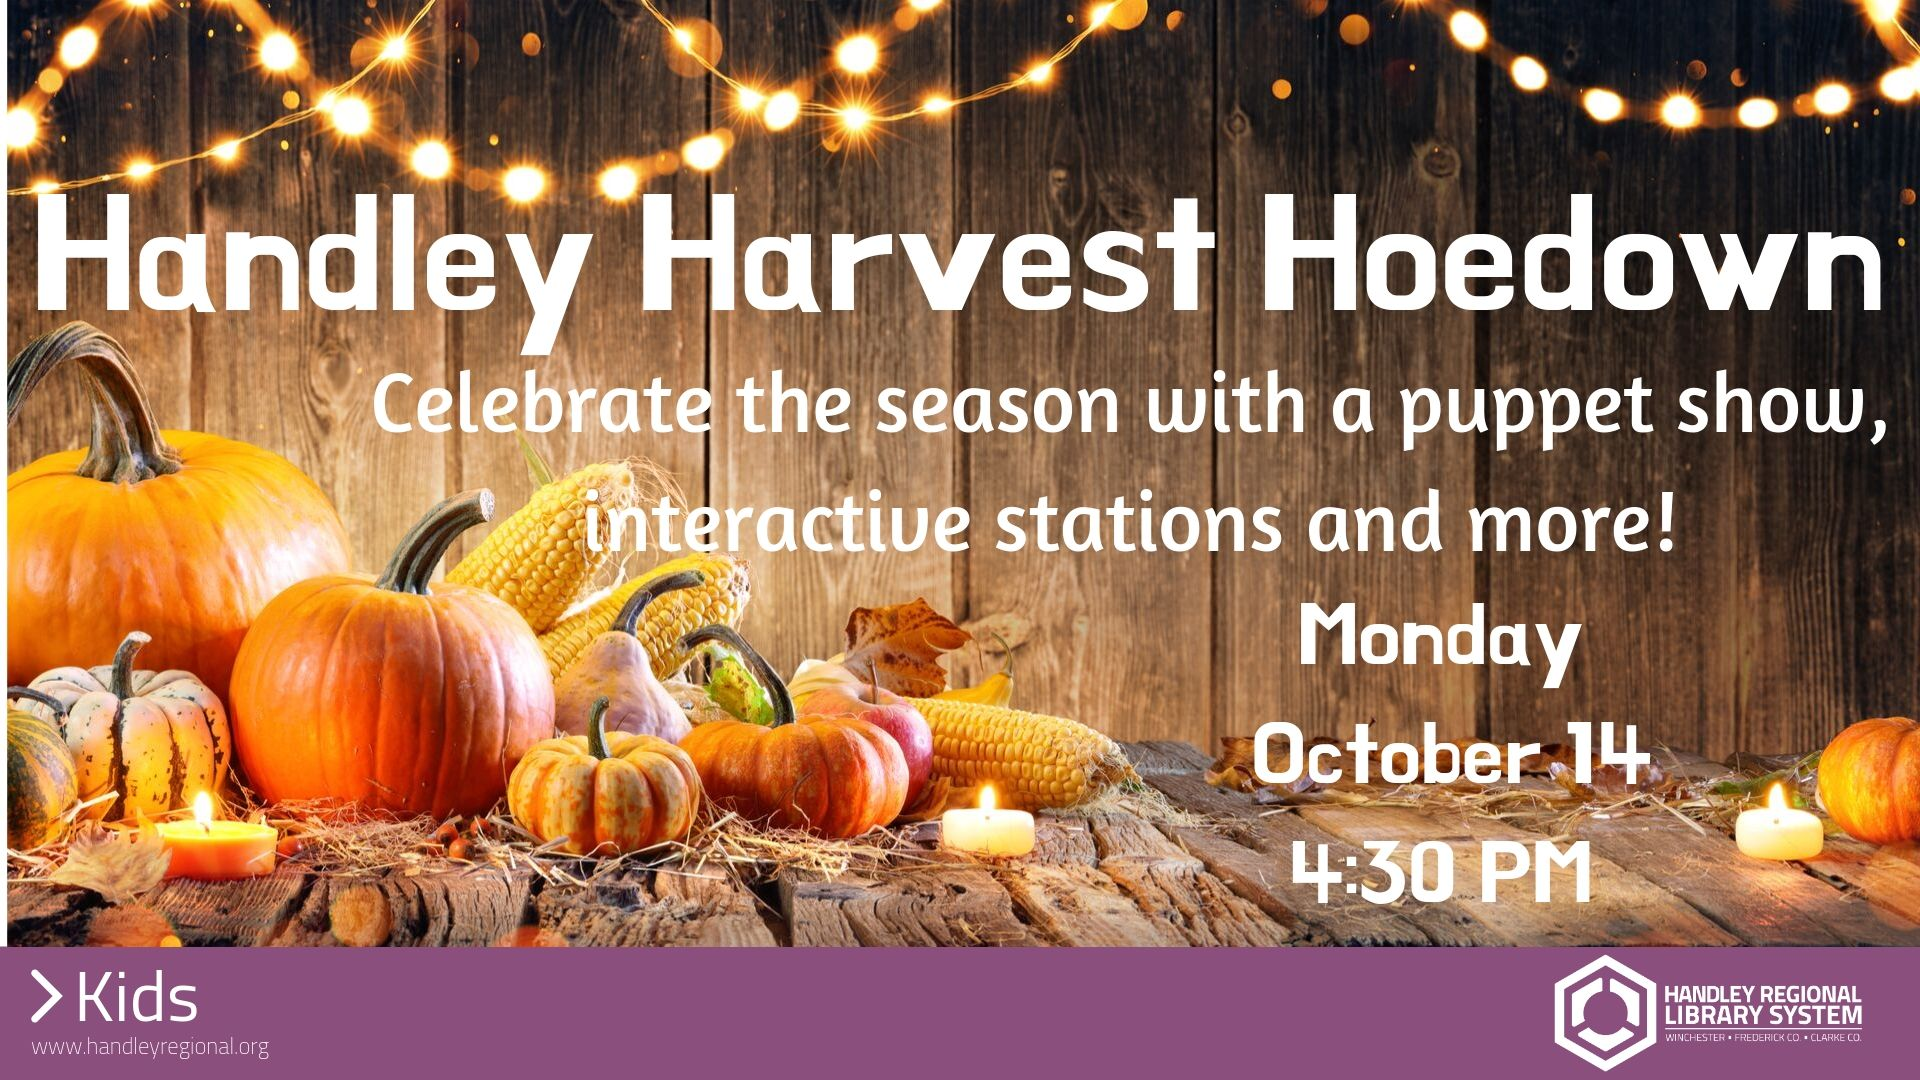 Handley Harvest Hoedown